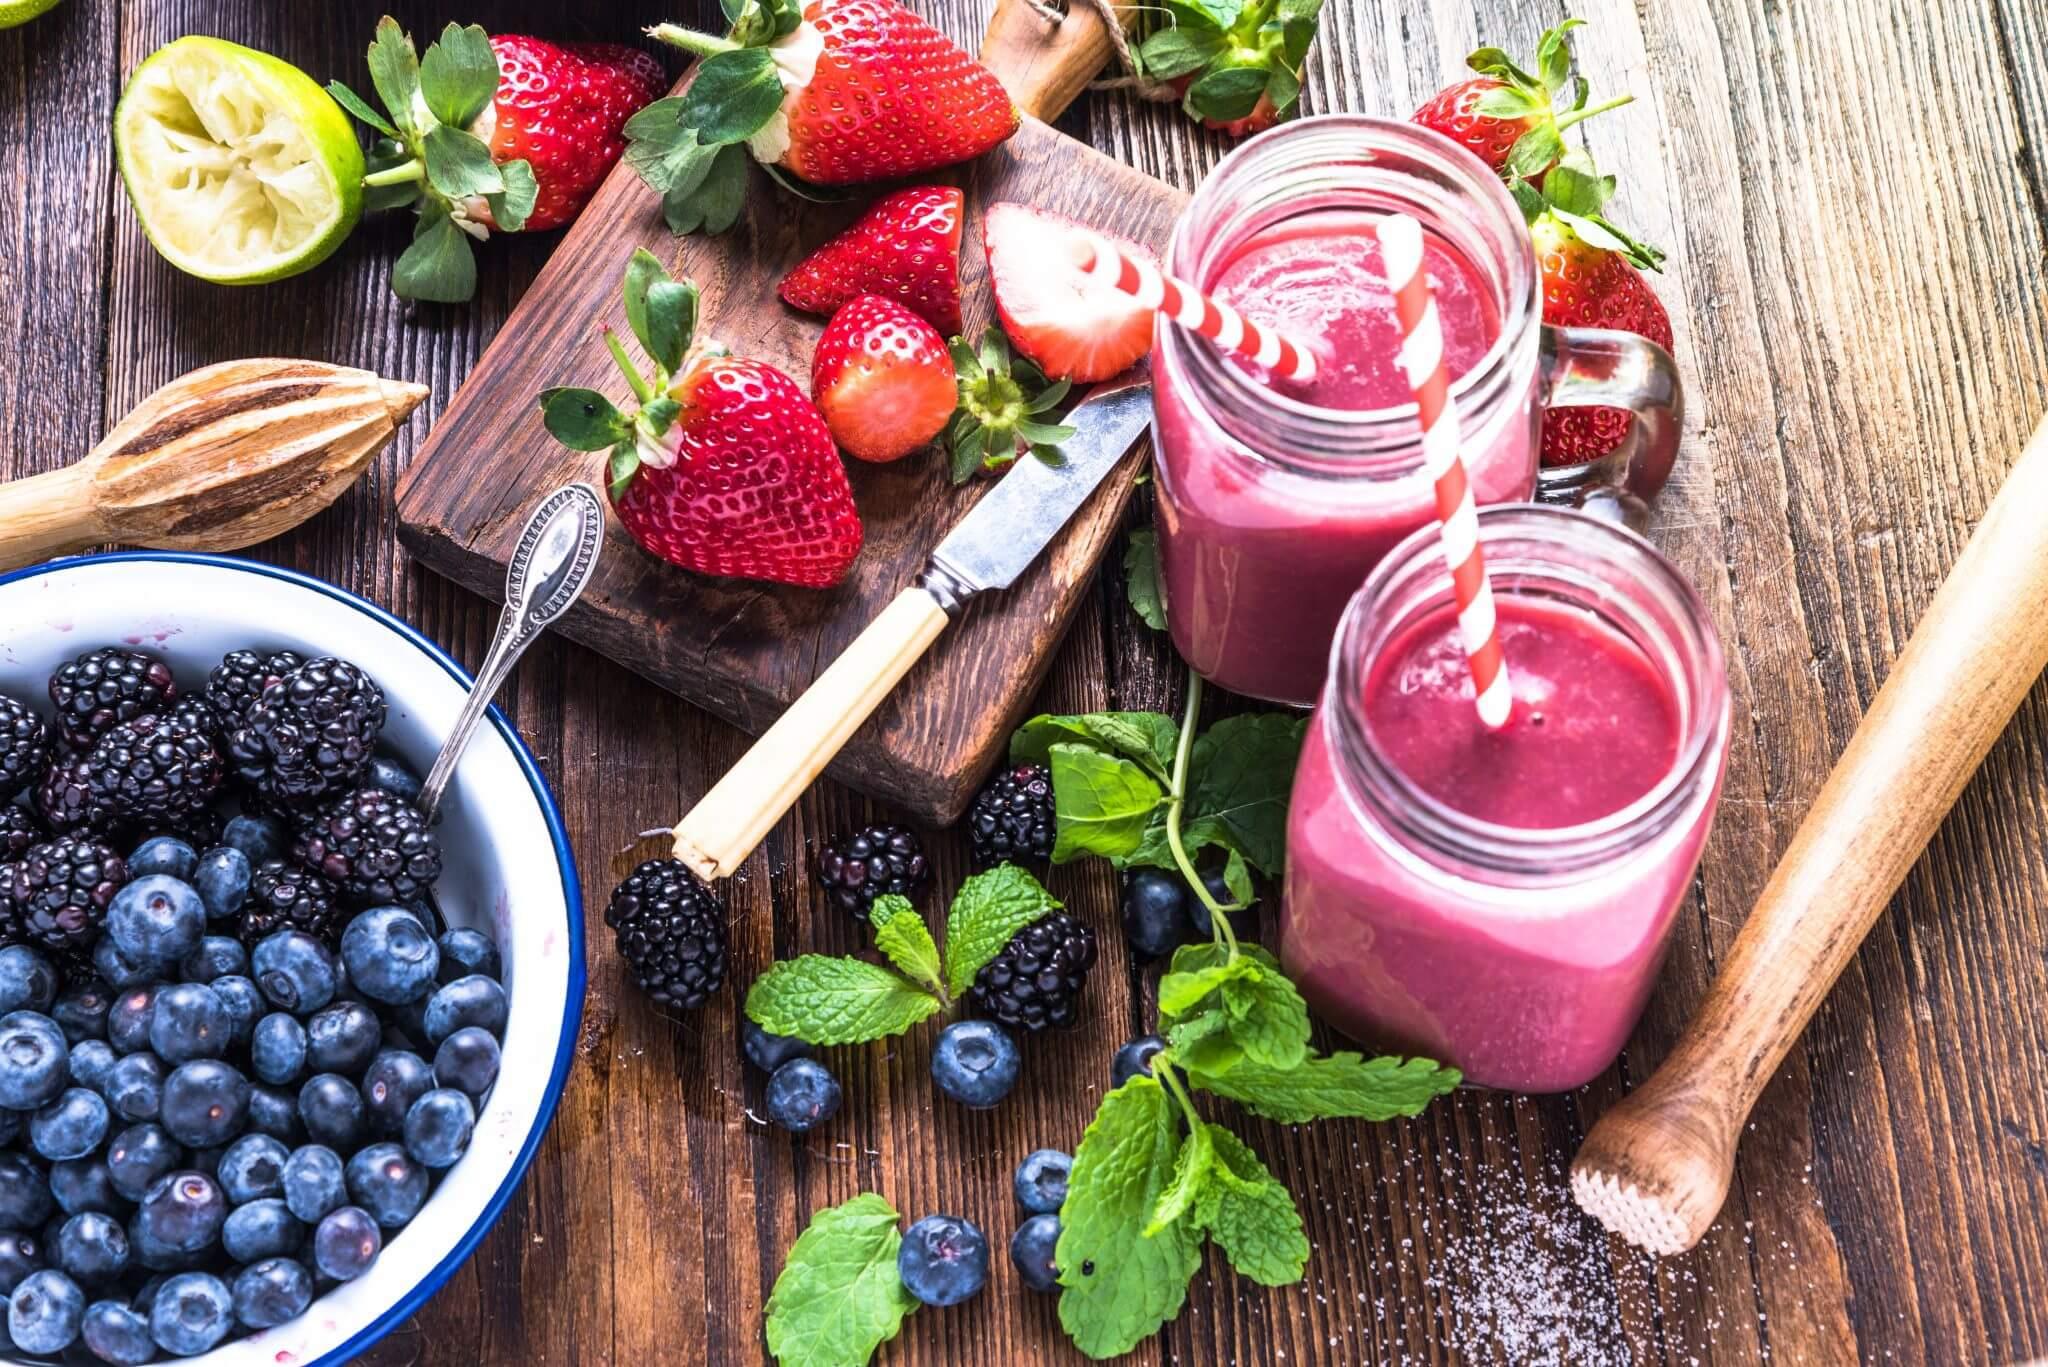 Berry Smoothies